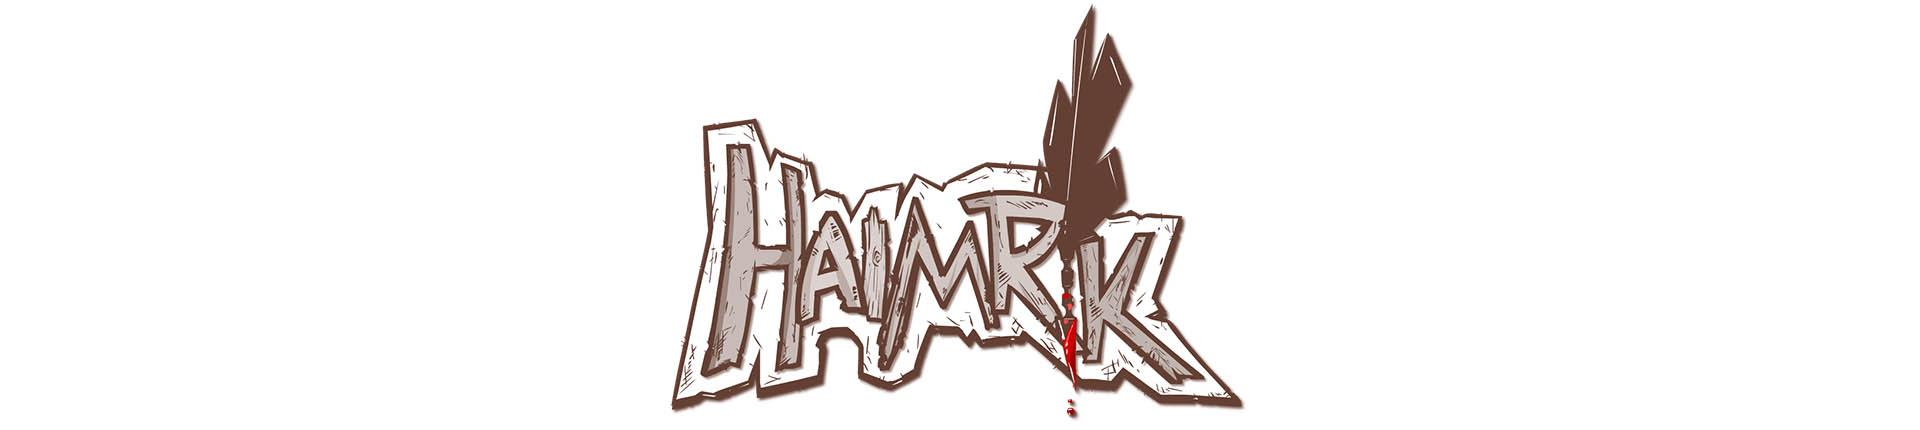 <a href='https://www.mightygamesmag.de/all-game-list/haimrik/'>Zum Spiel</a>